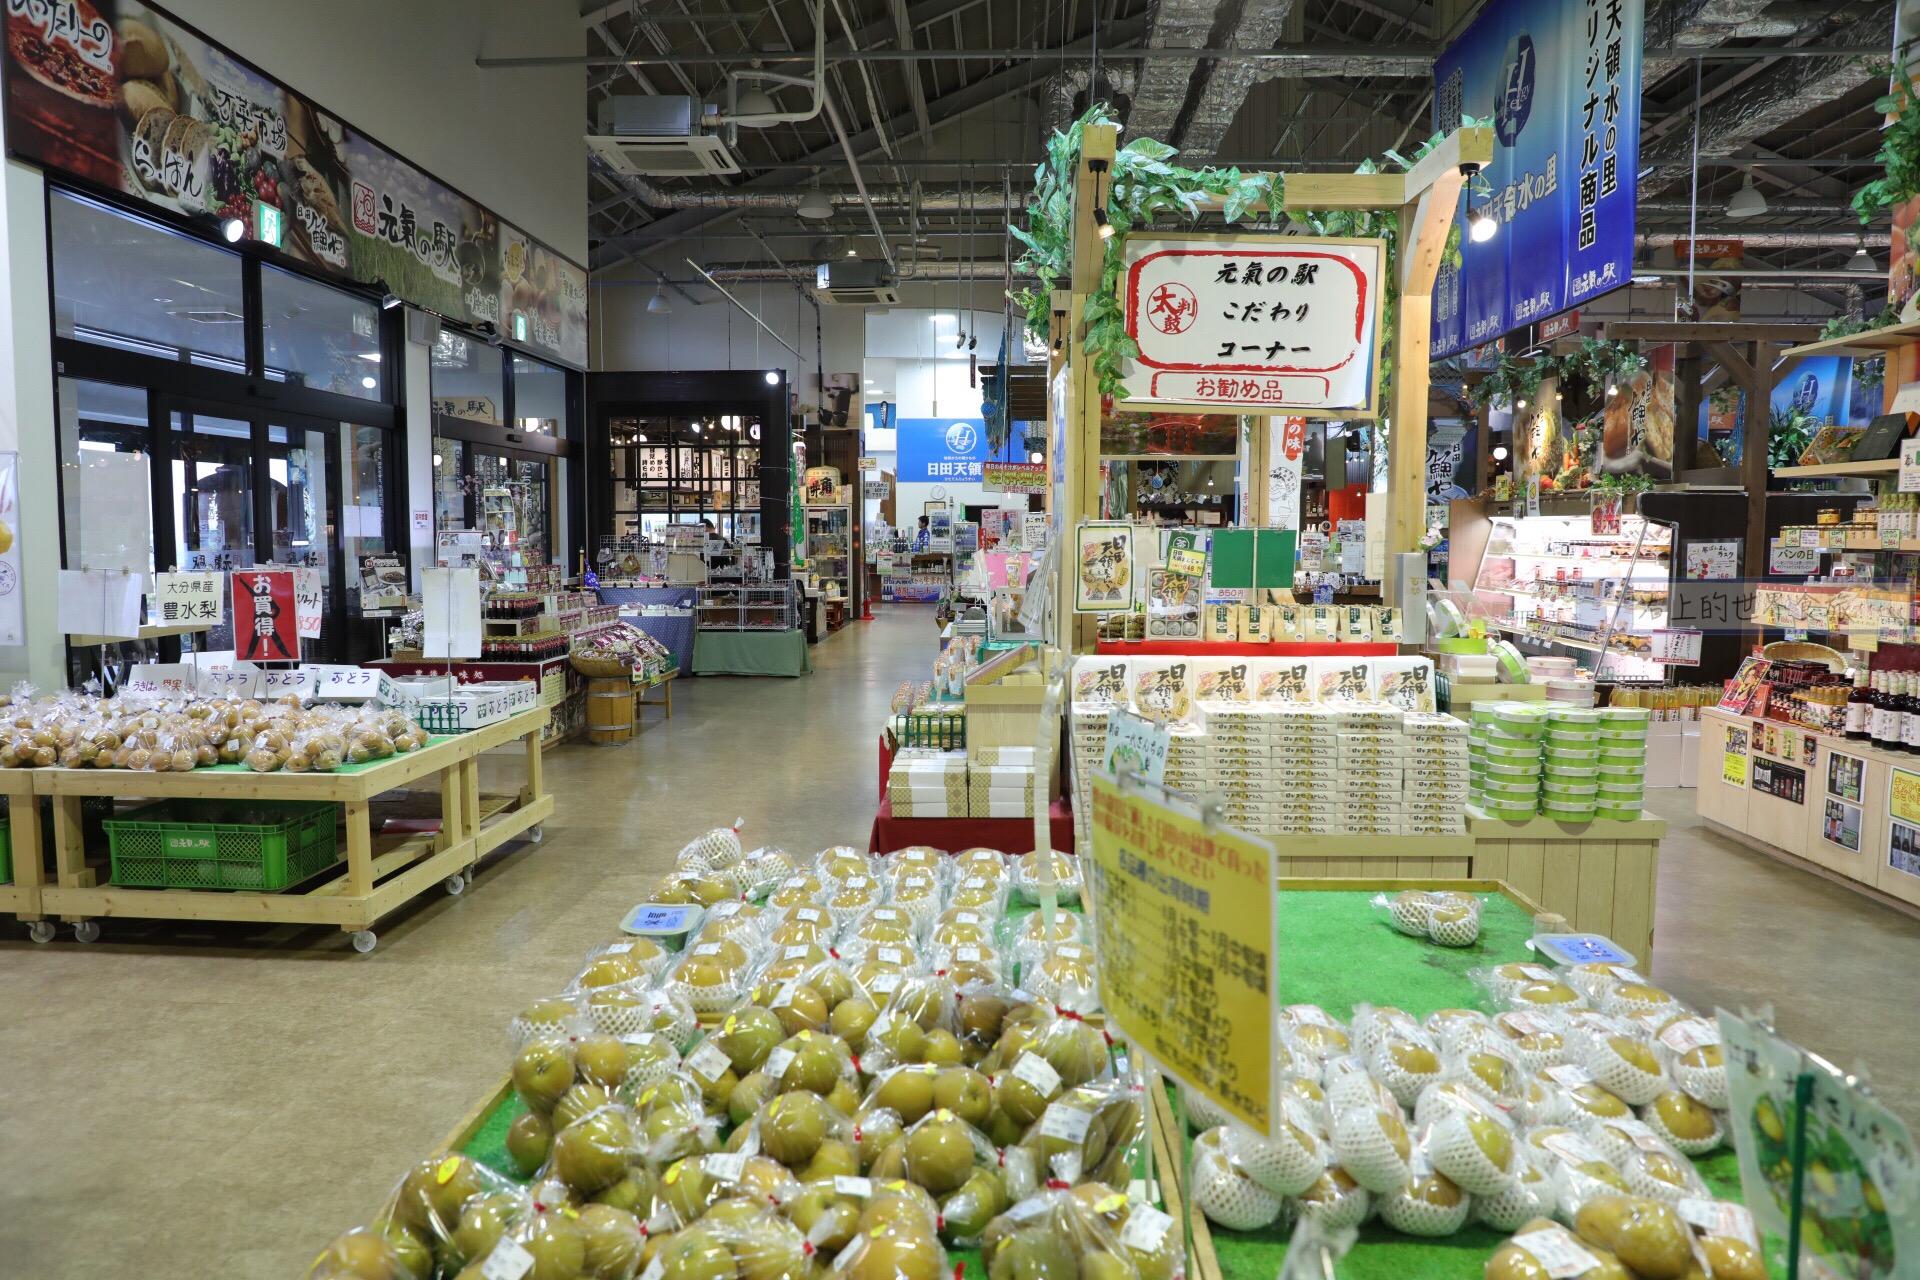 SUNQPASS玩遍九州-福岡.大分.日田.熊本.阿蘇6天溫泉美食行程 @右上的世界食旅